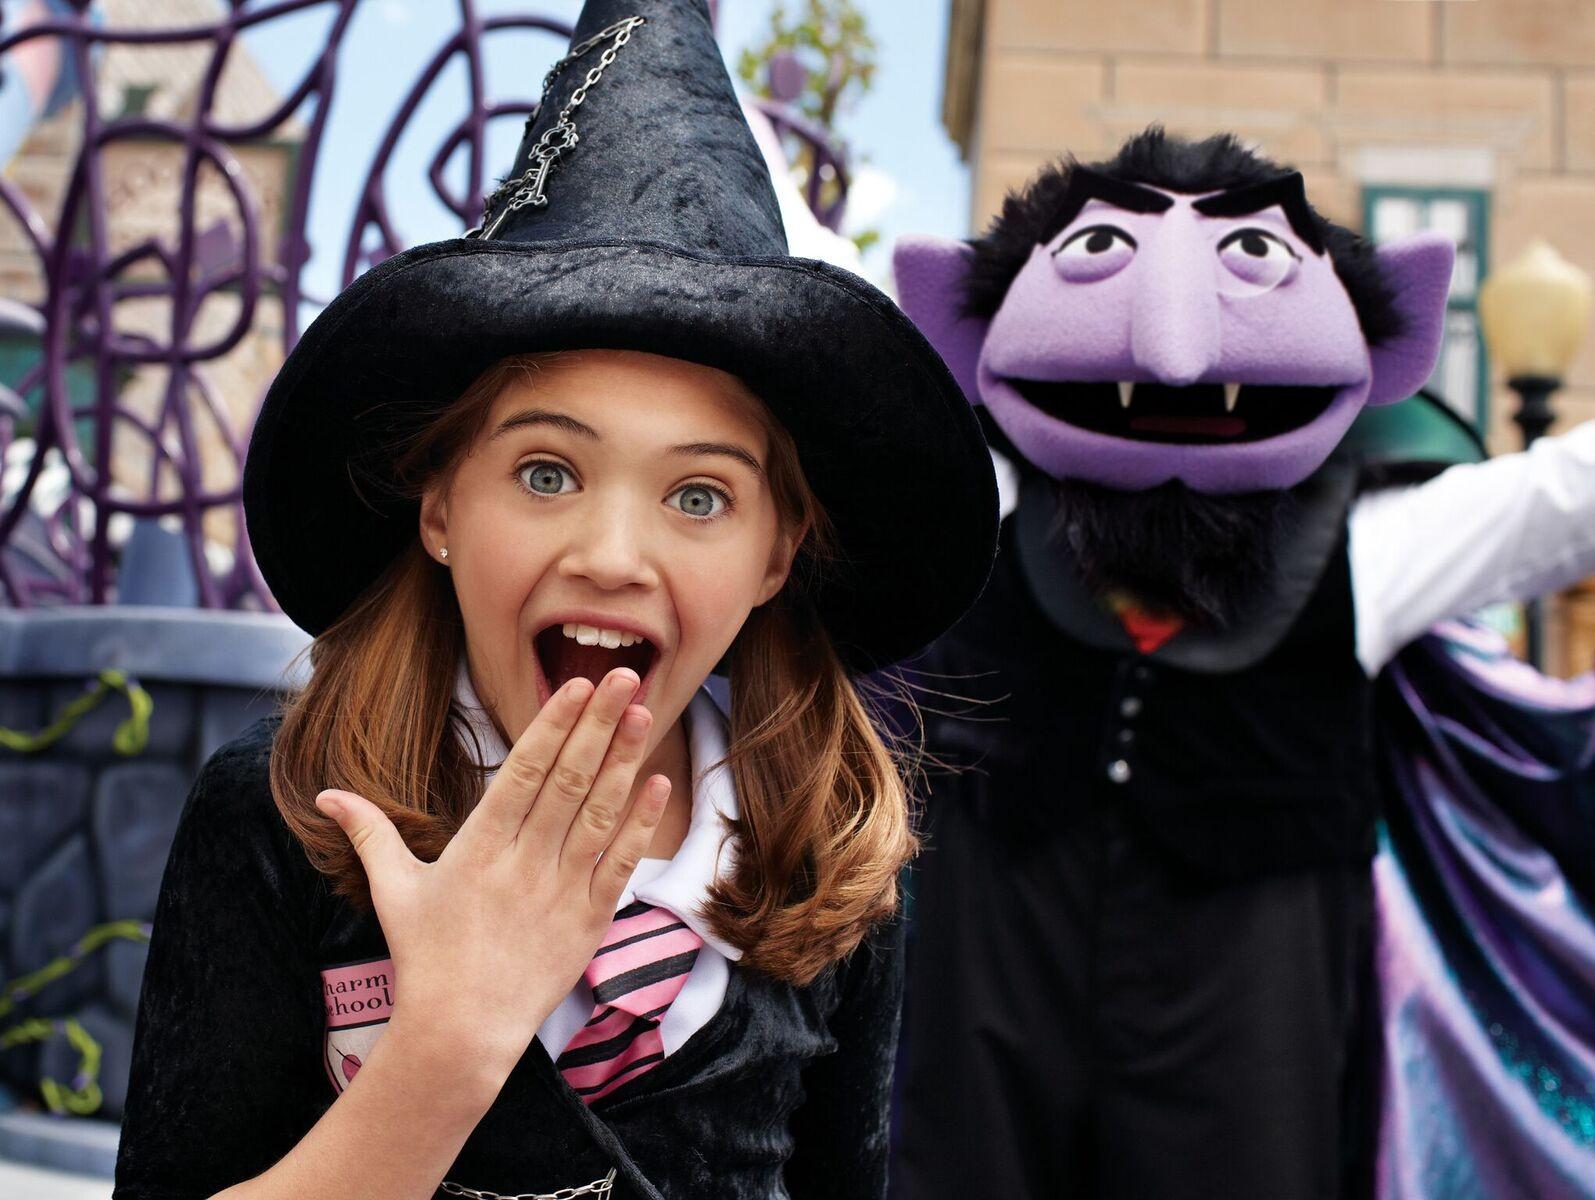 Halloween Spooktacular Seaworld.Seaworld S Halloween Spooktacular Returns For Another Year